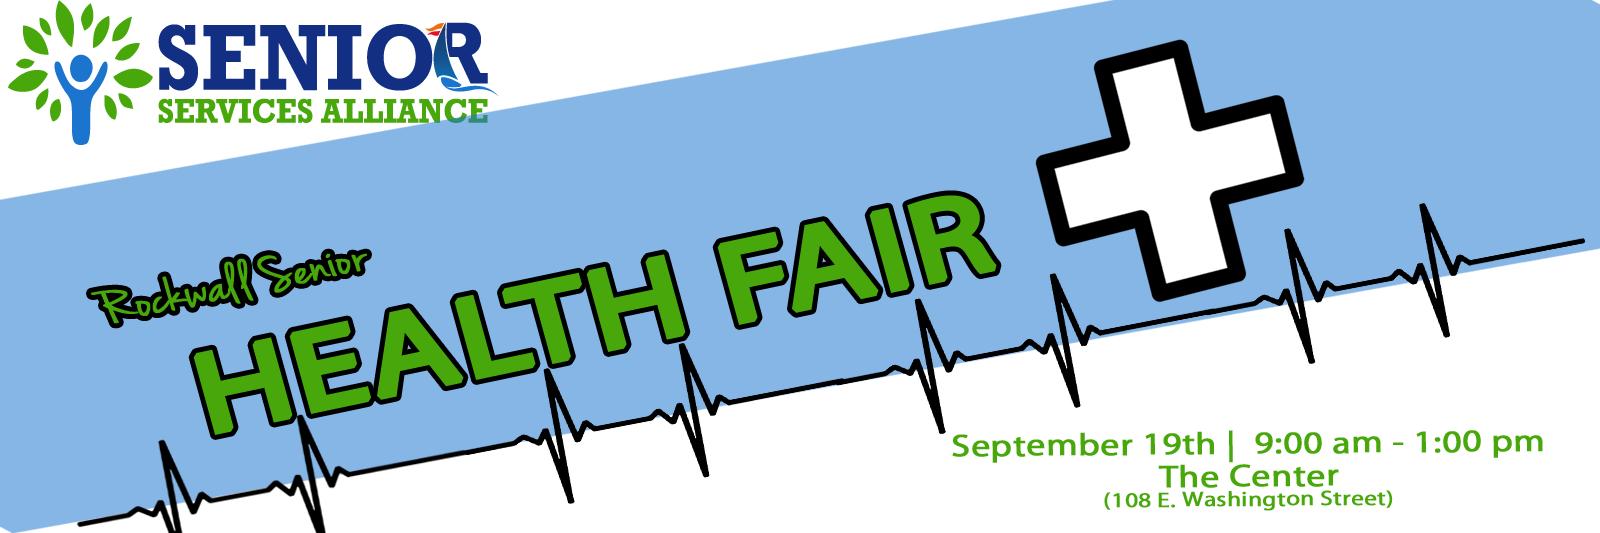 Health-Fair-Website-Header.png